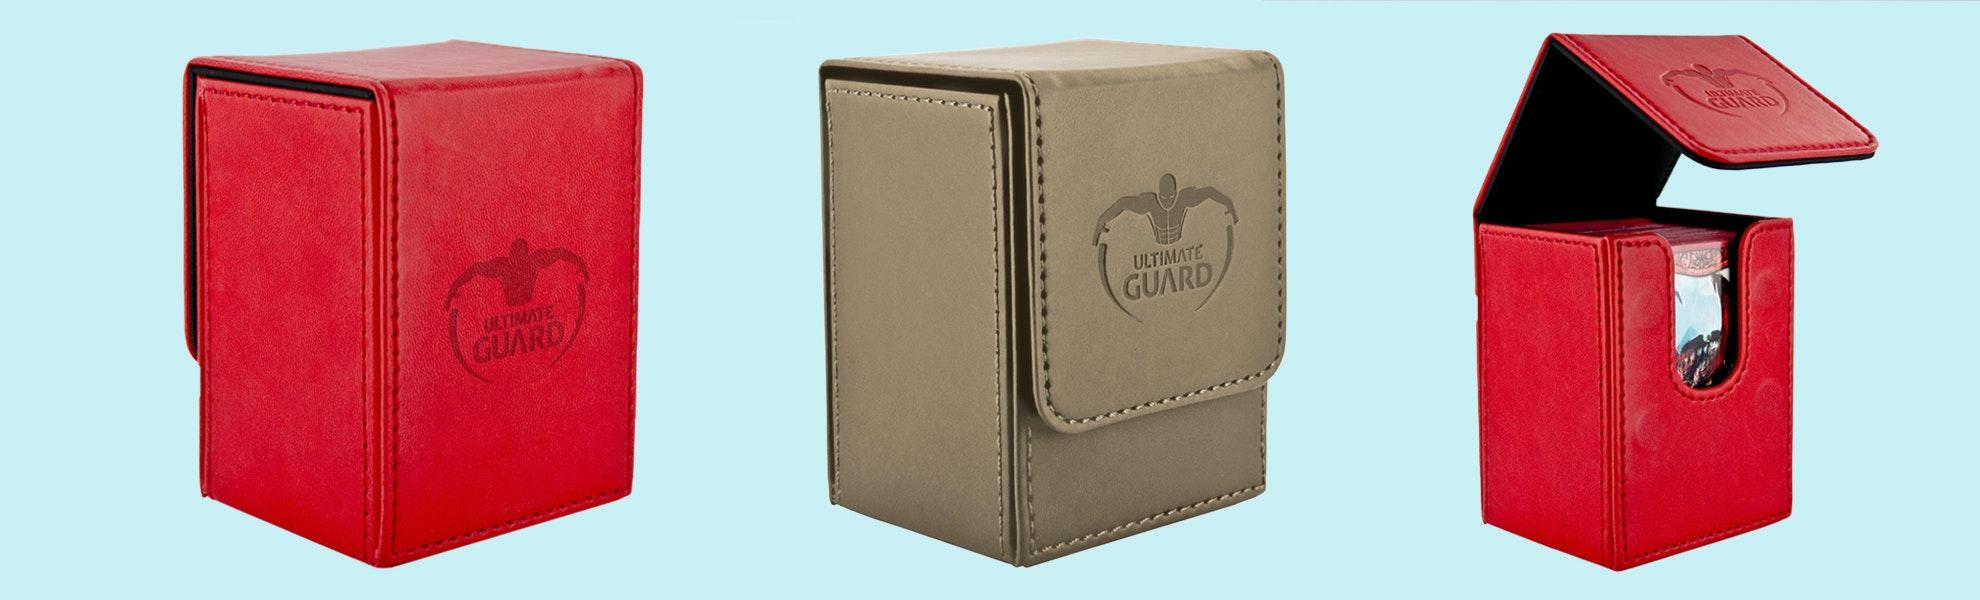 Ultimate Guard Flip Deck Case 80+ Leatherette